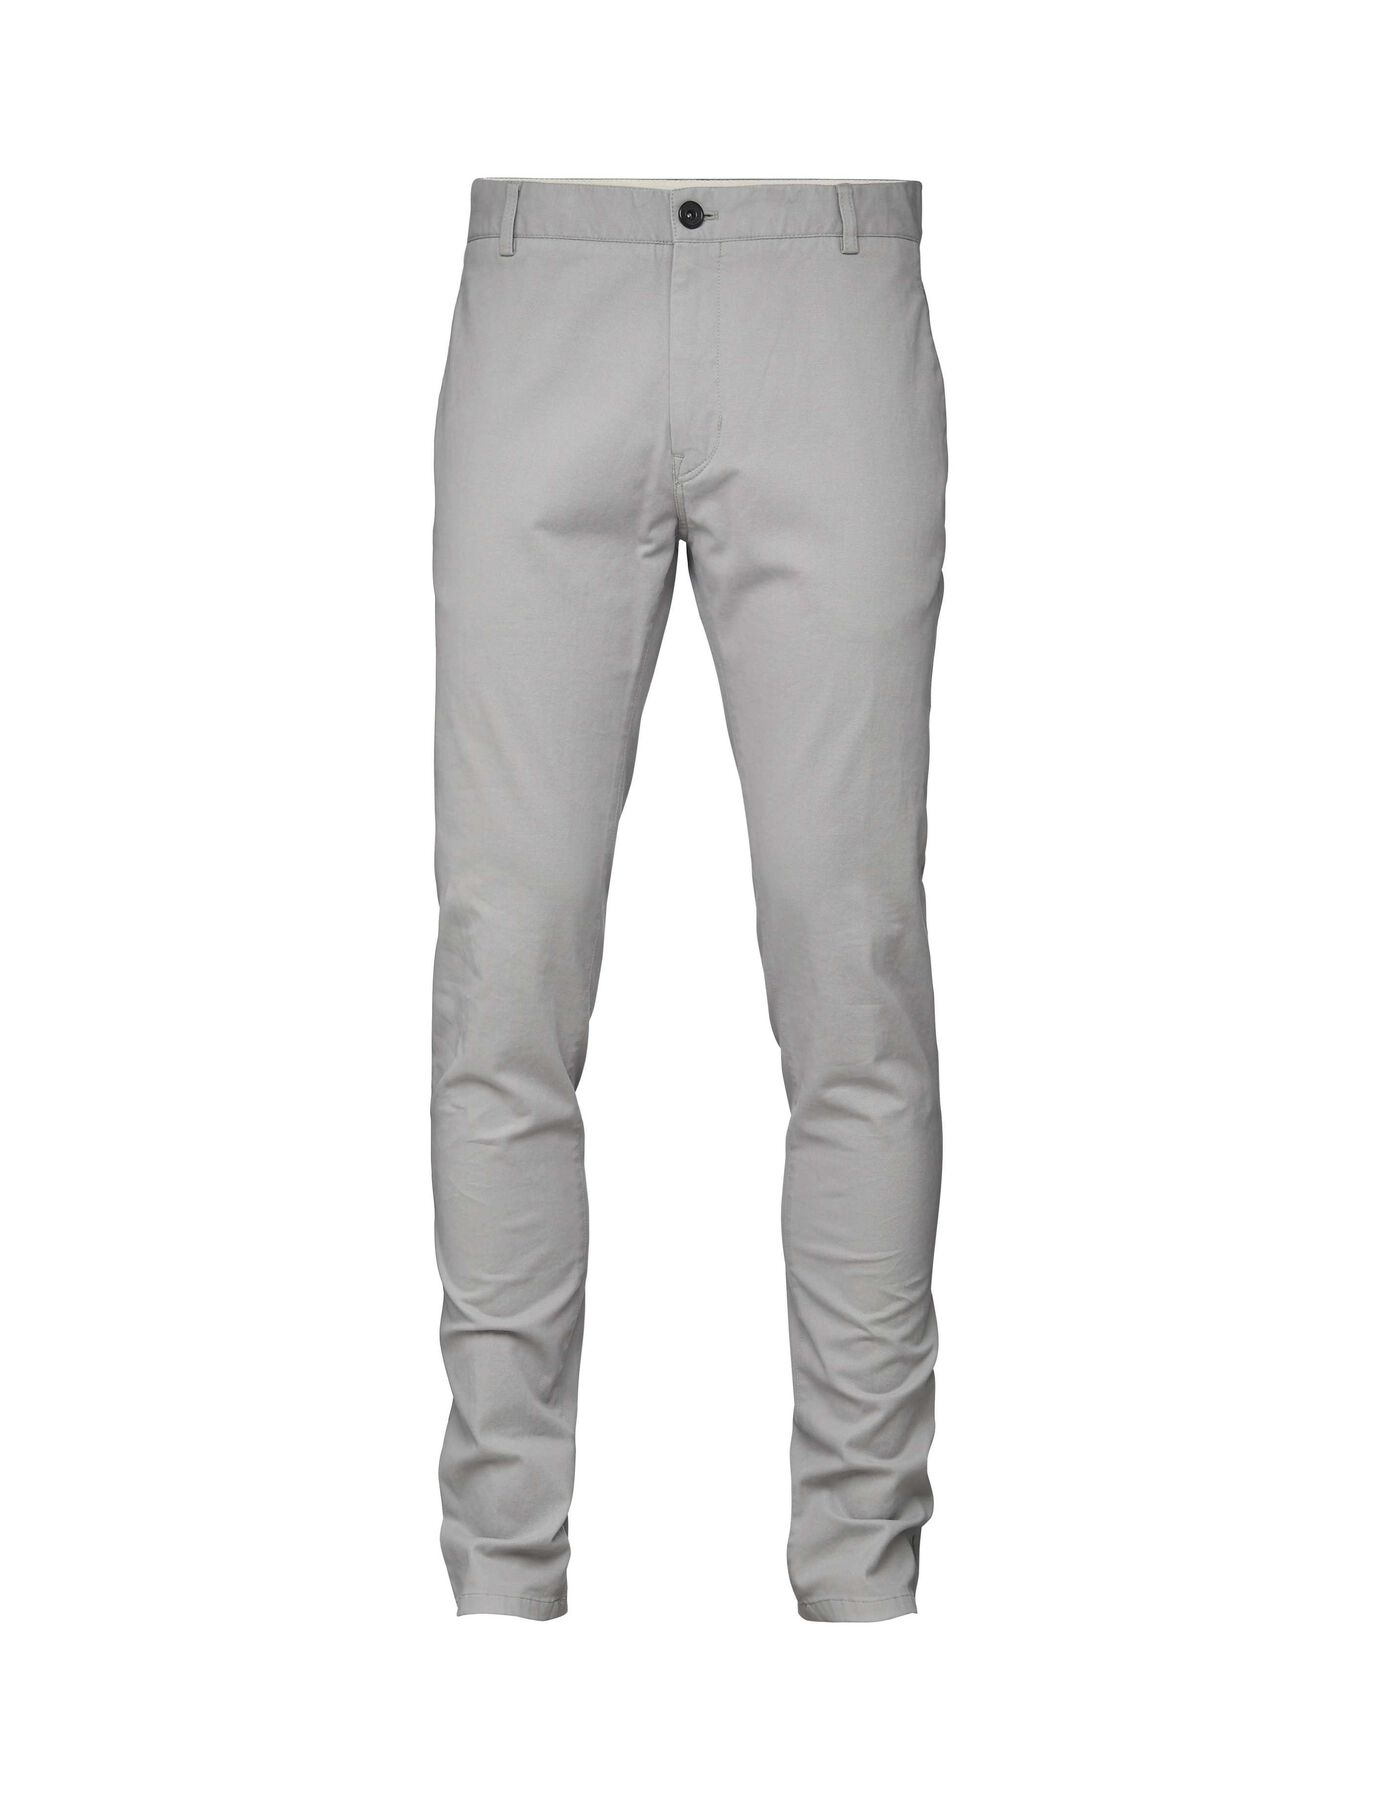 Transit trousers